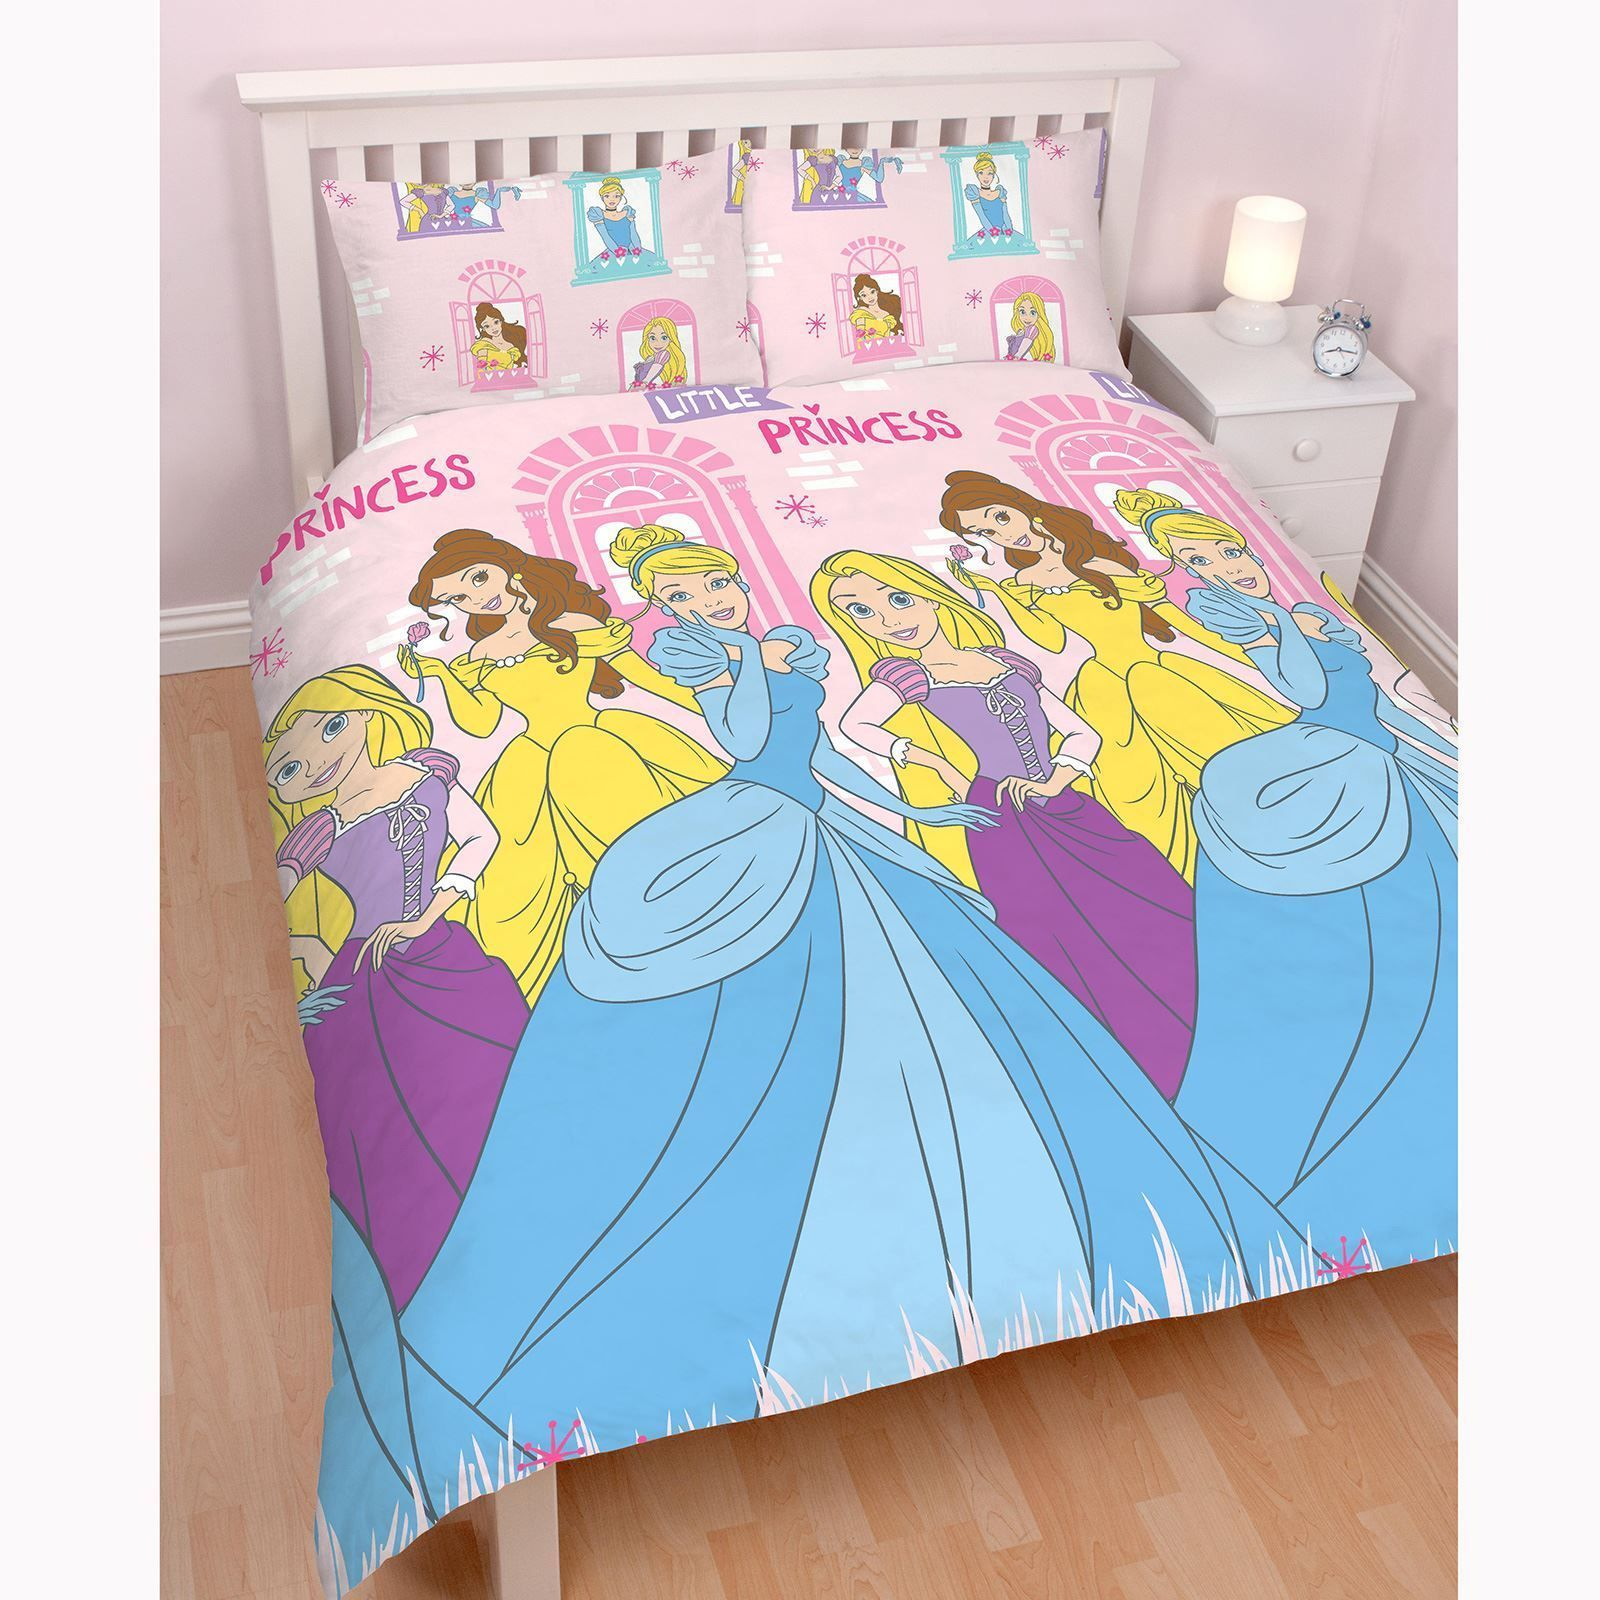 Disney Princess Boulevard Double Size Quilt Cover Set. Available ... : quilt cover australia buy online - Adamdwight.com